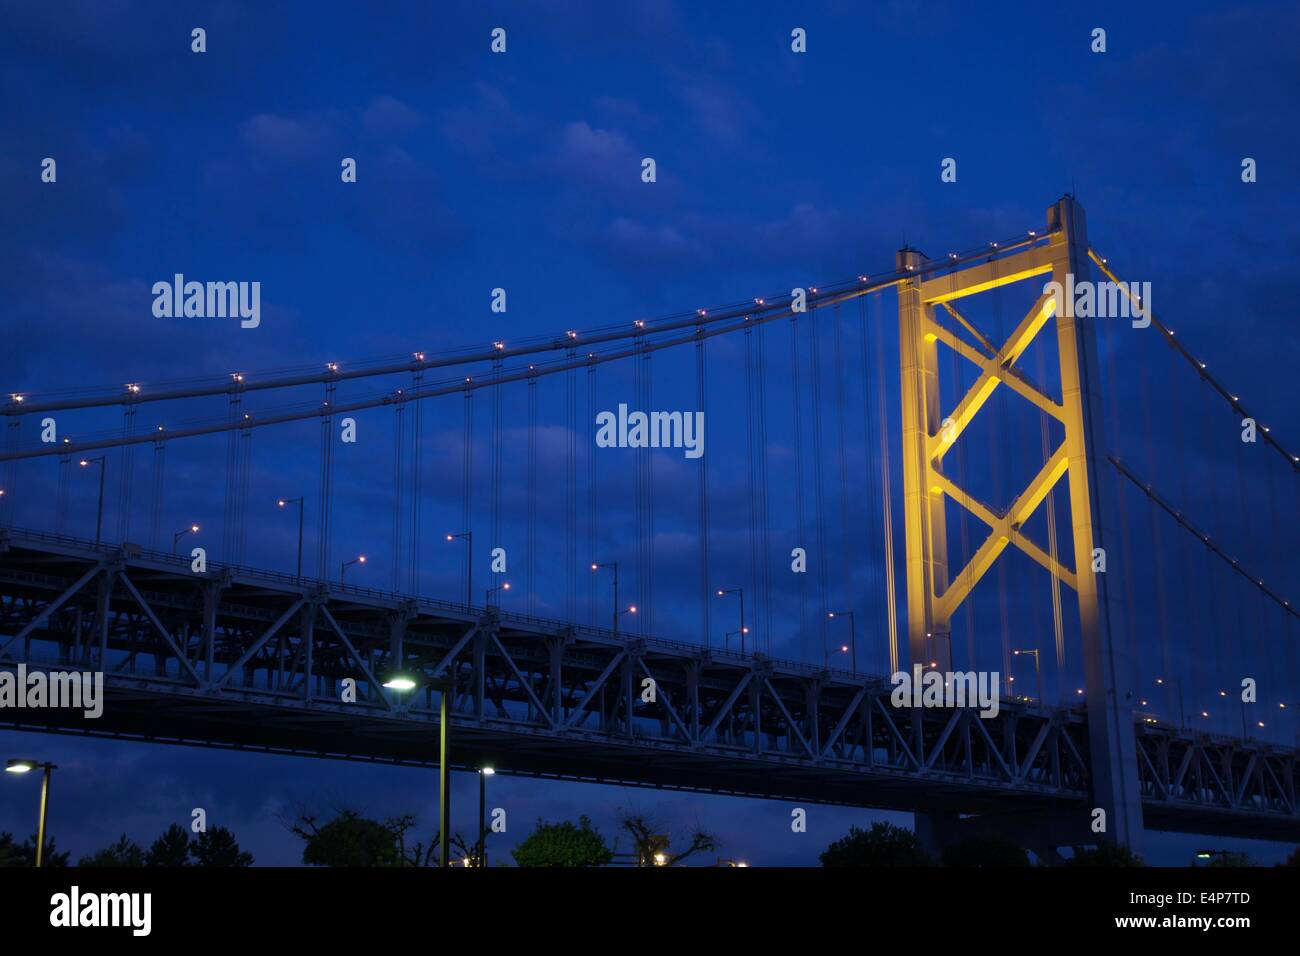 Great Seto Bridge (Seto Ohashi) at Dusk in Kagawa Prefecture, Japan - Stock Image